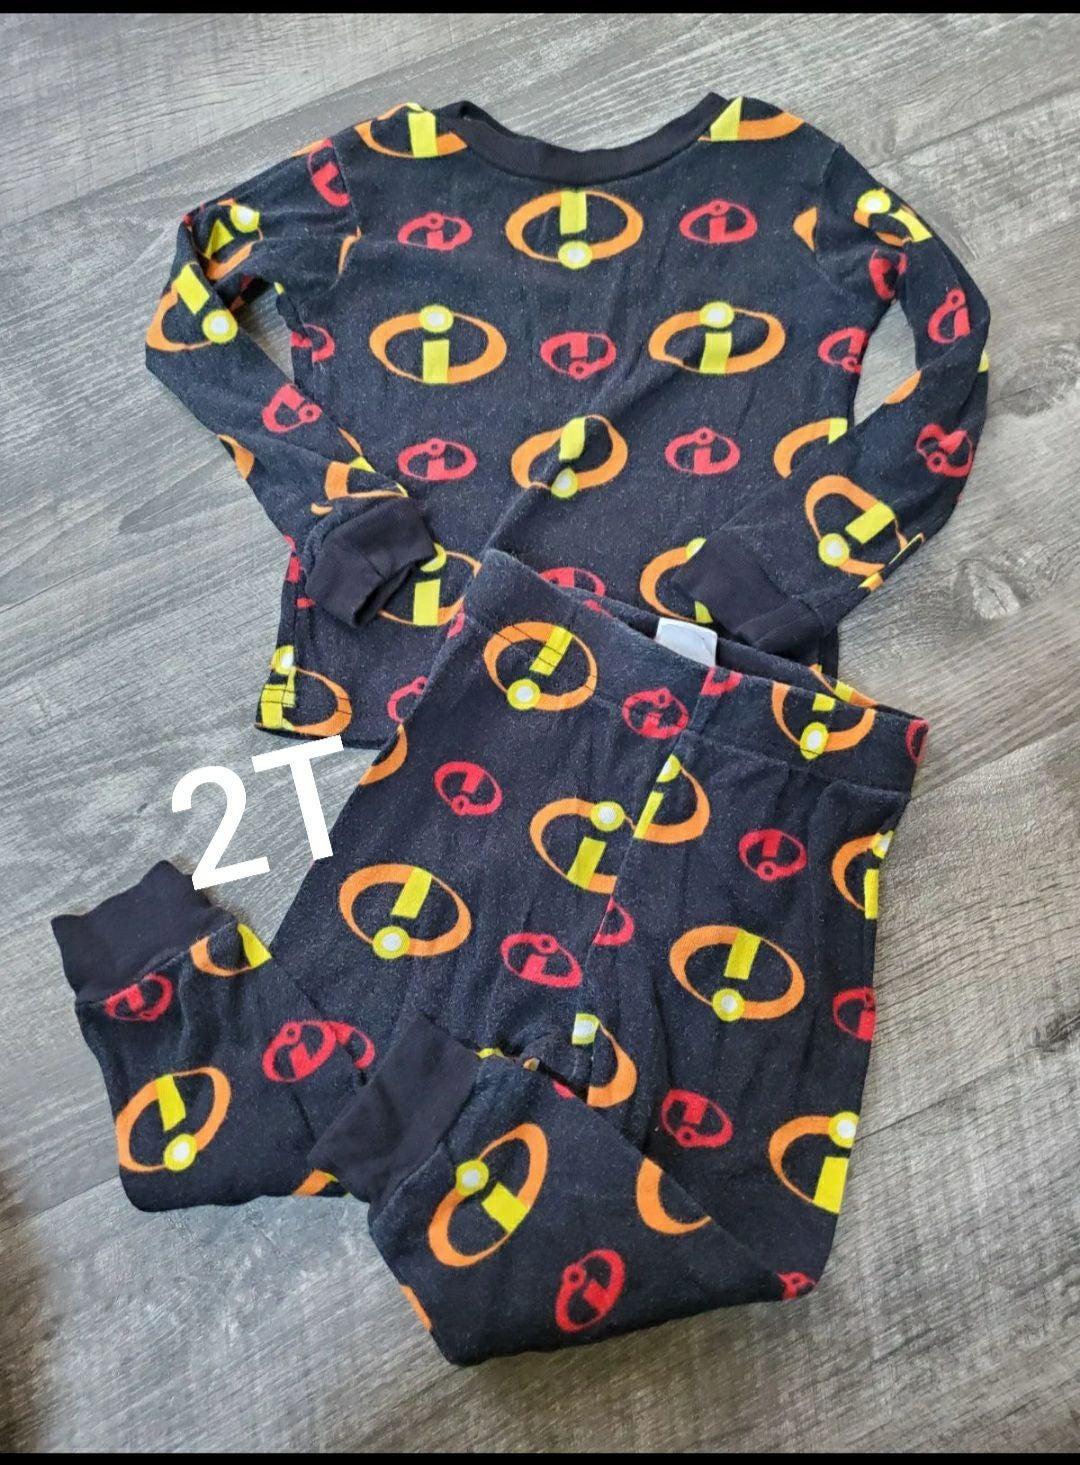 2T pajama incredables